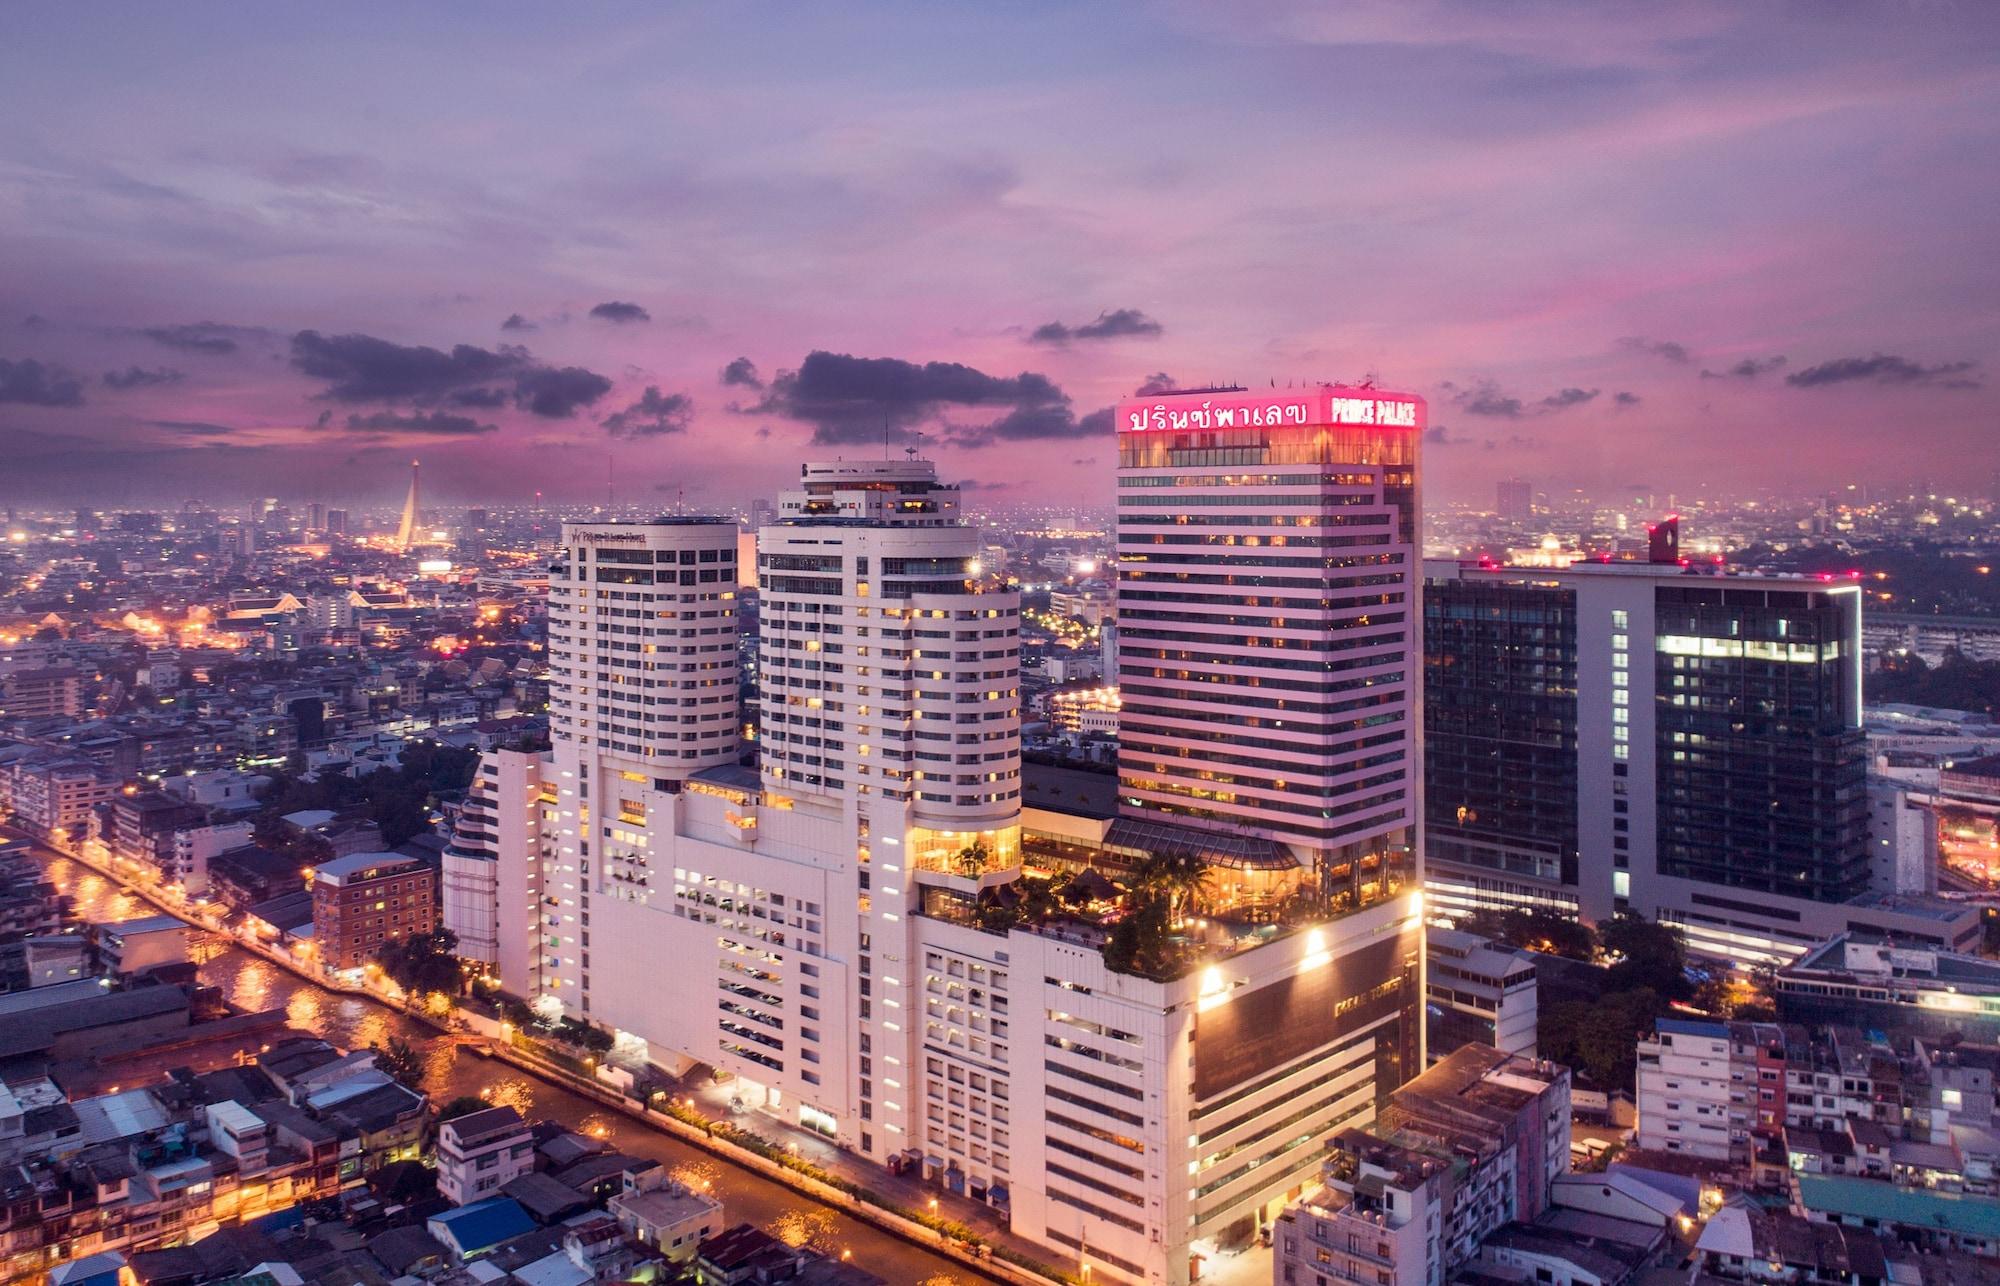 Prince Palace Hotel, Pom Pram Sattru